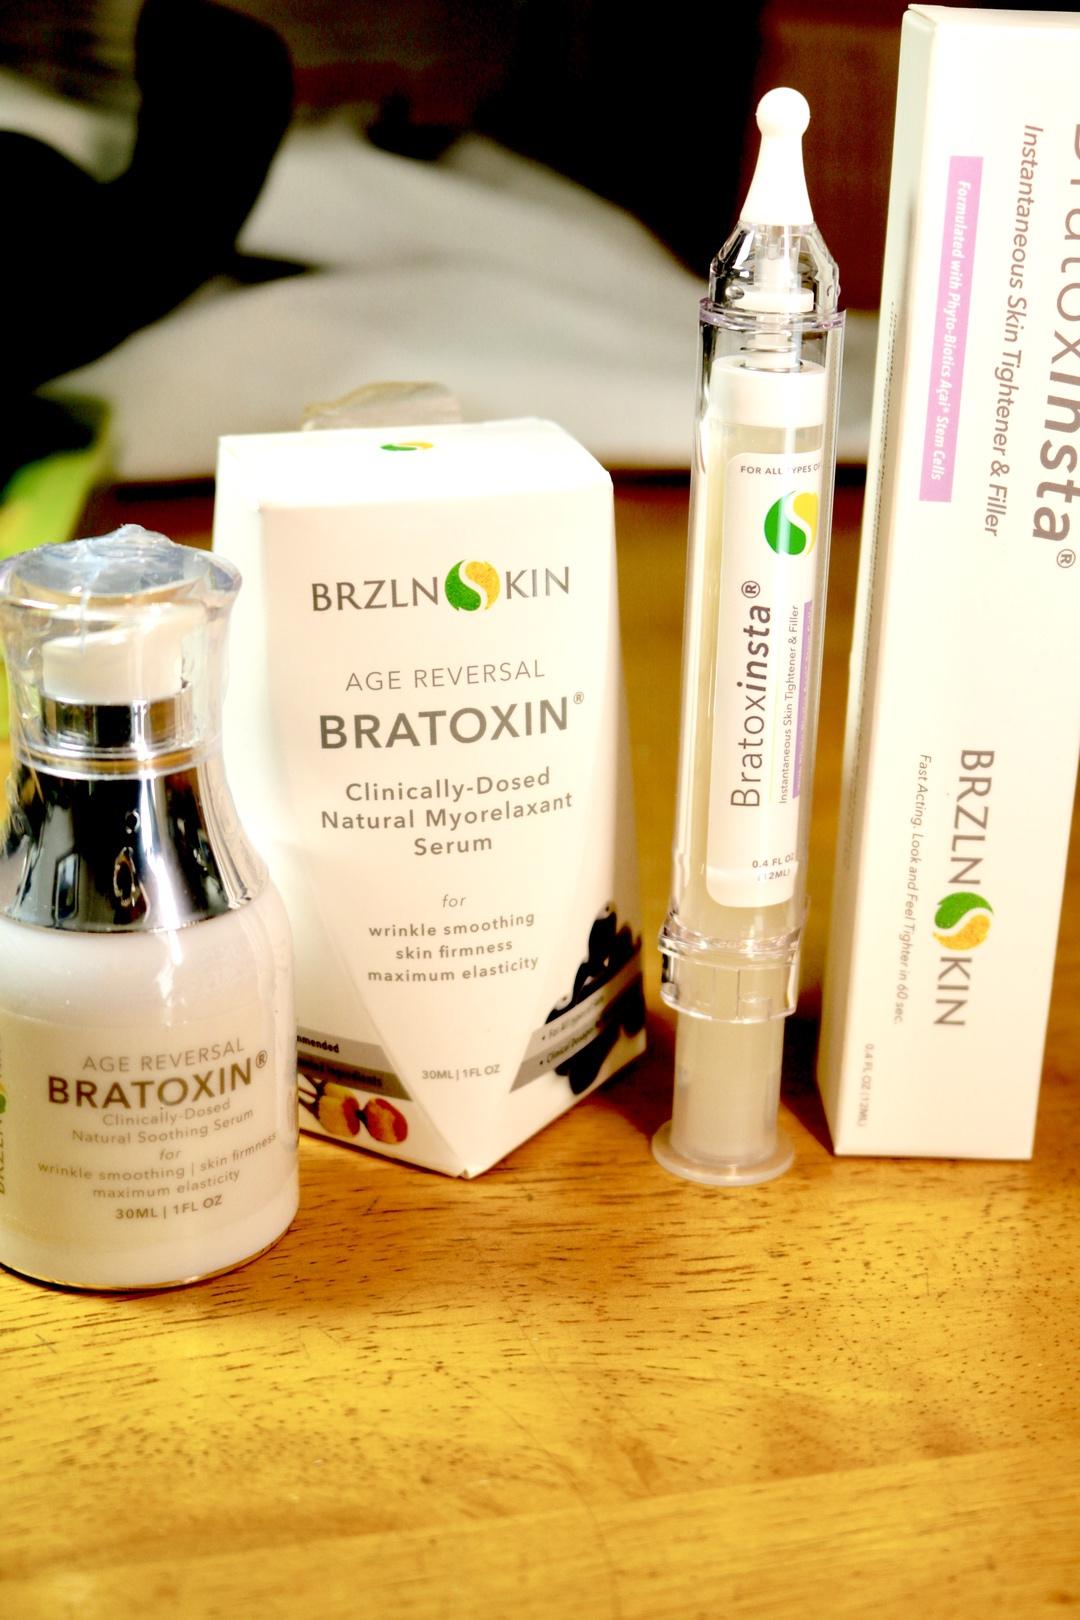 BRZLNSKIN #BRZLNSKIN #beauty #makeup #ontheblog #blogger #ad